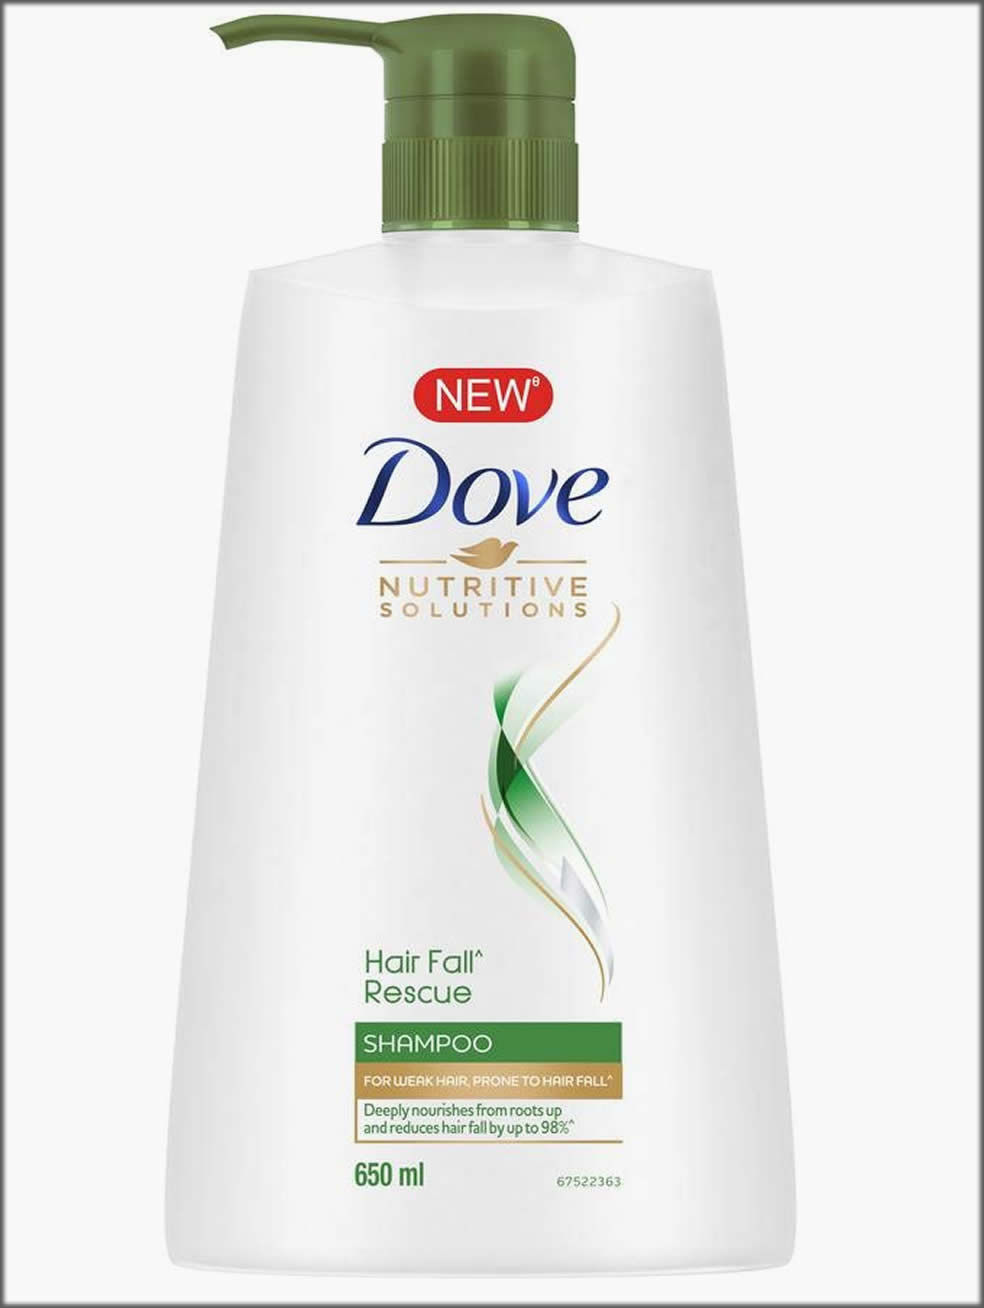 New Dove Hair Fall Rescue Shampoo